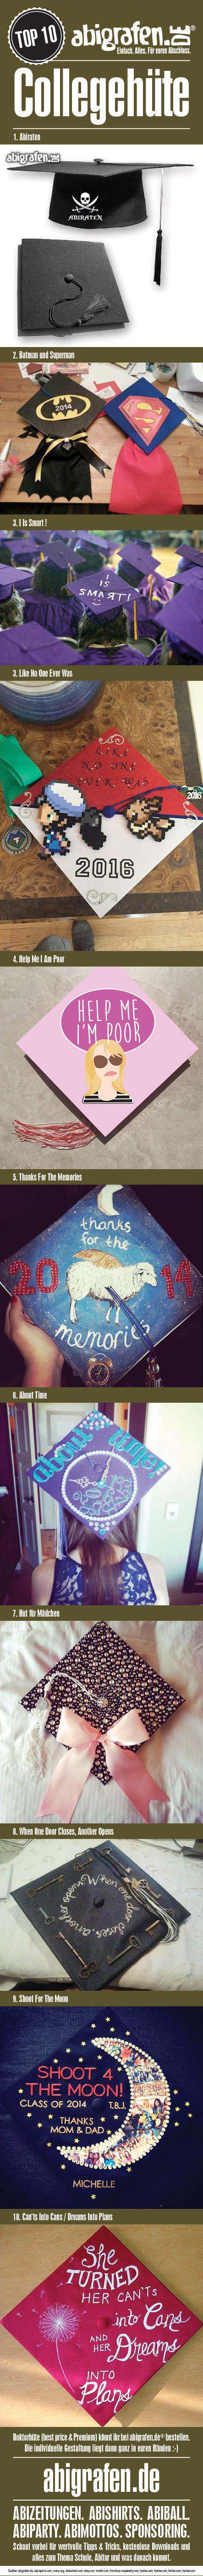 #doktorhuete #studentenhuete #college #caps #Schuelerhut #Graduation #Cap #Senior #Cap #Abschlusshut #Hut #Abitur